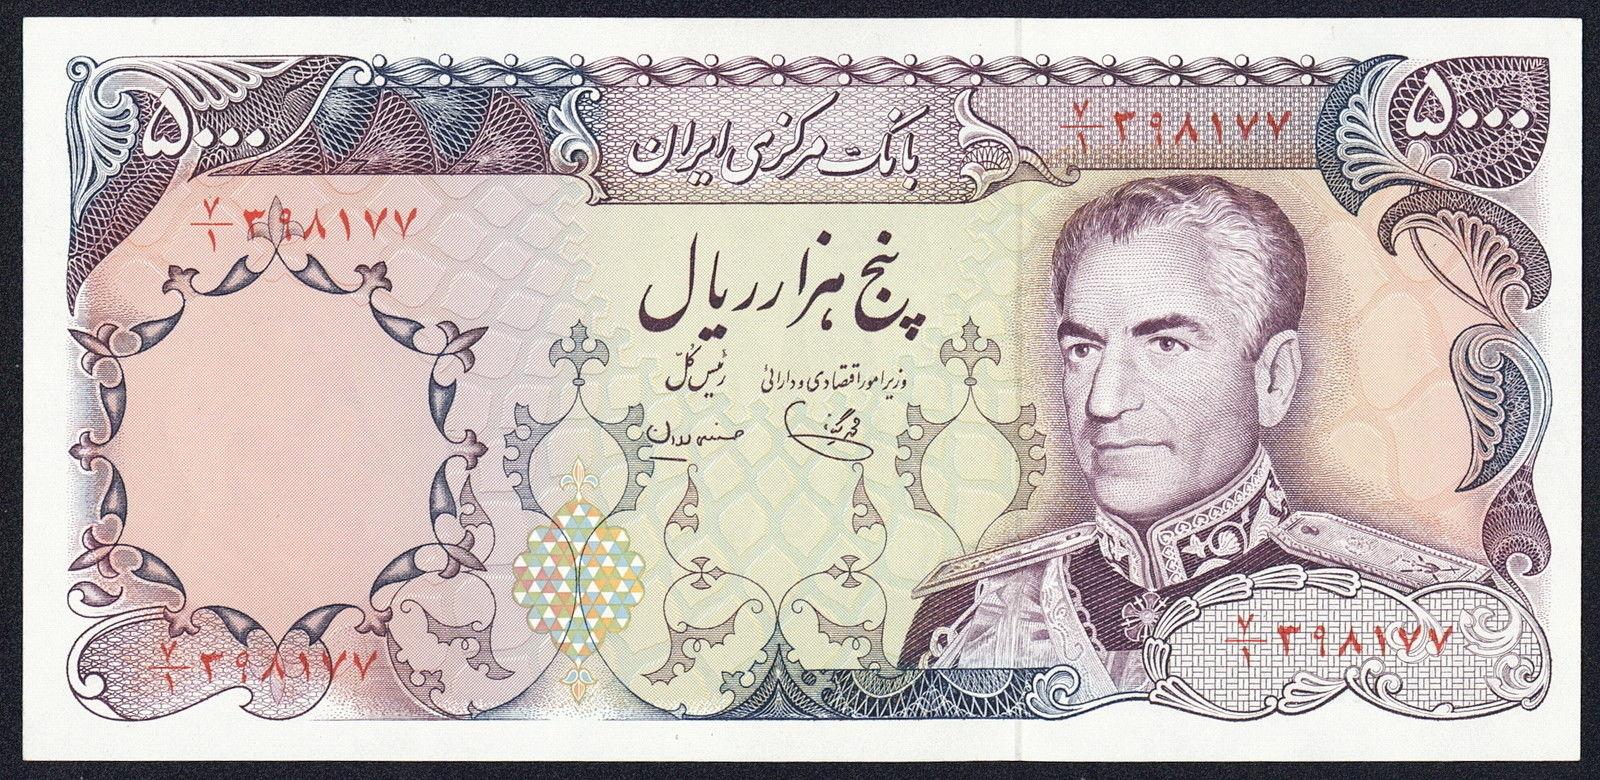 Iran 5000 Rials Banknote 1974 Mohammad Reza Shah Pahlavi